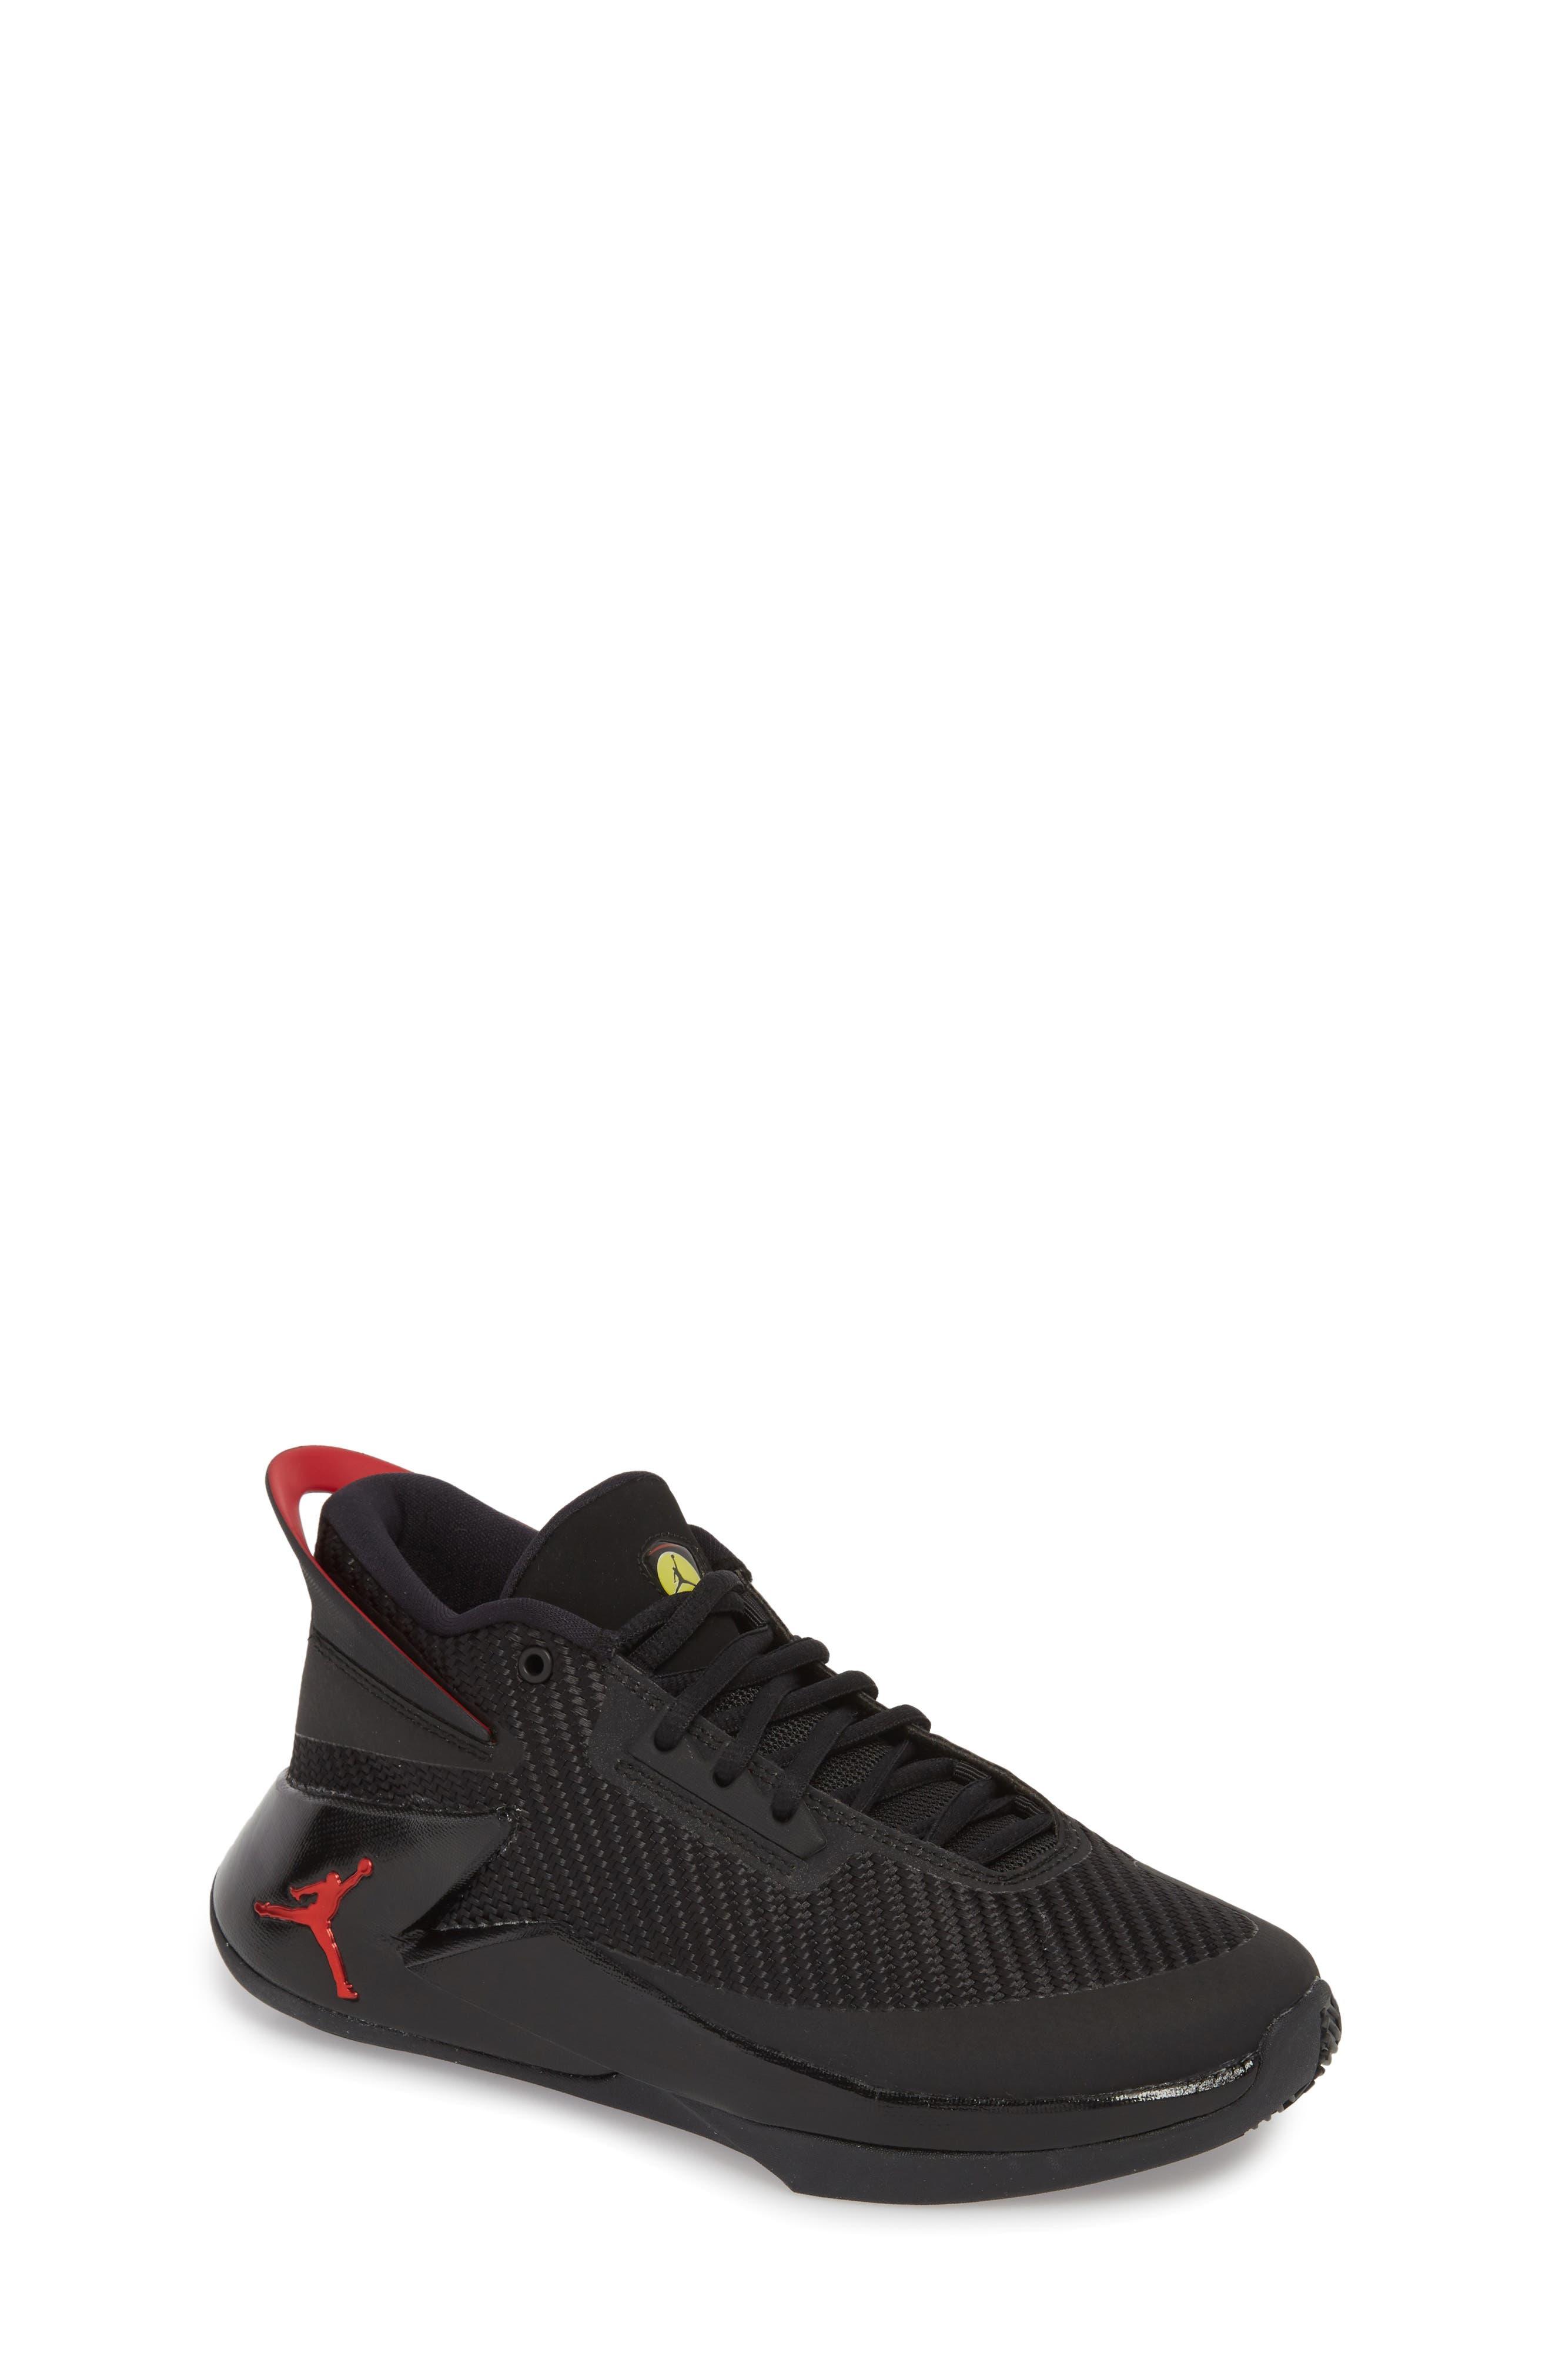 Boys Nike Jordan Fly Lockdown Sneaker